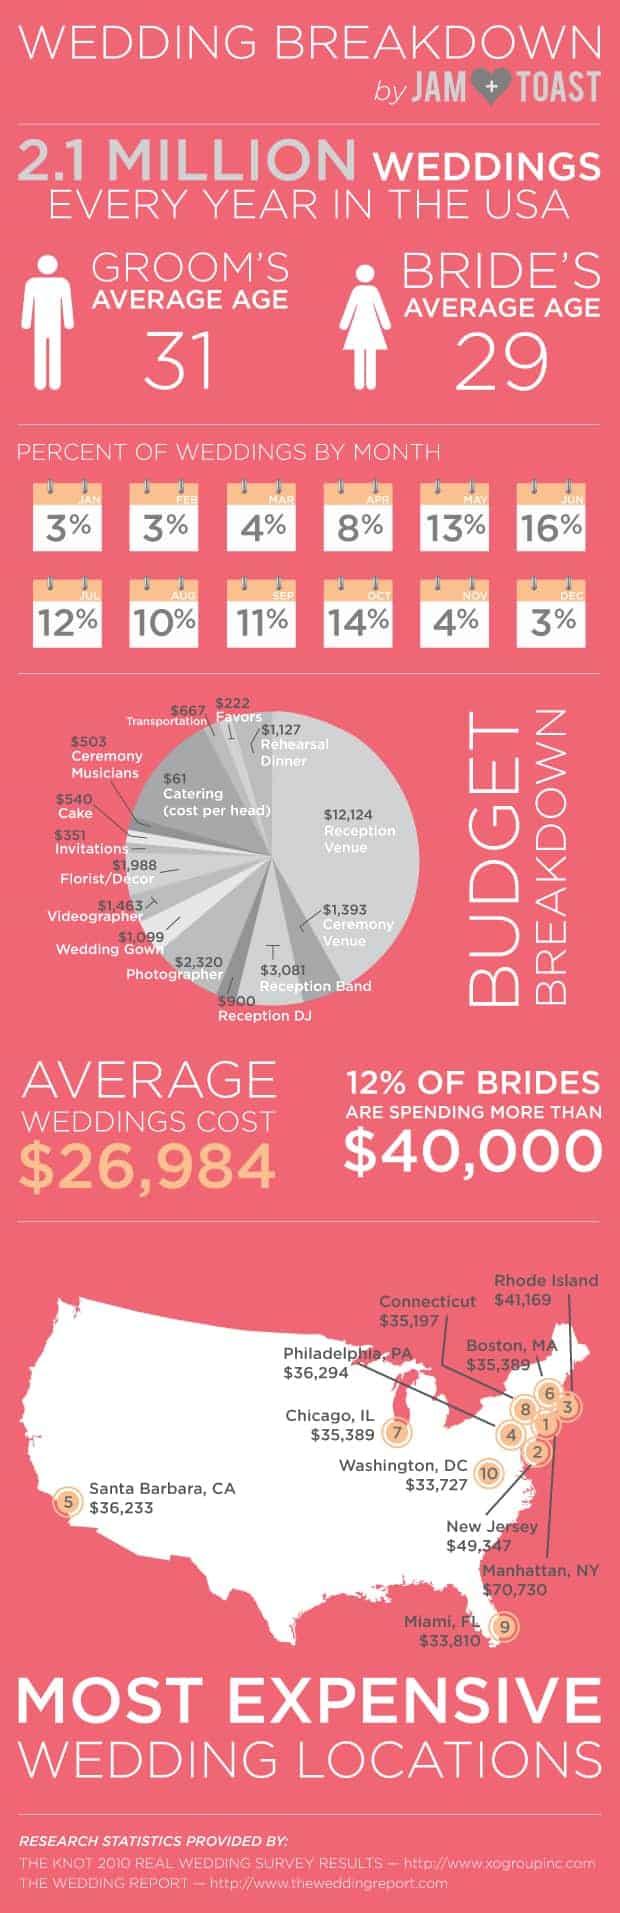 Wedding Breakdown Infographic